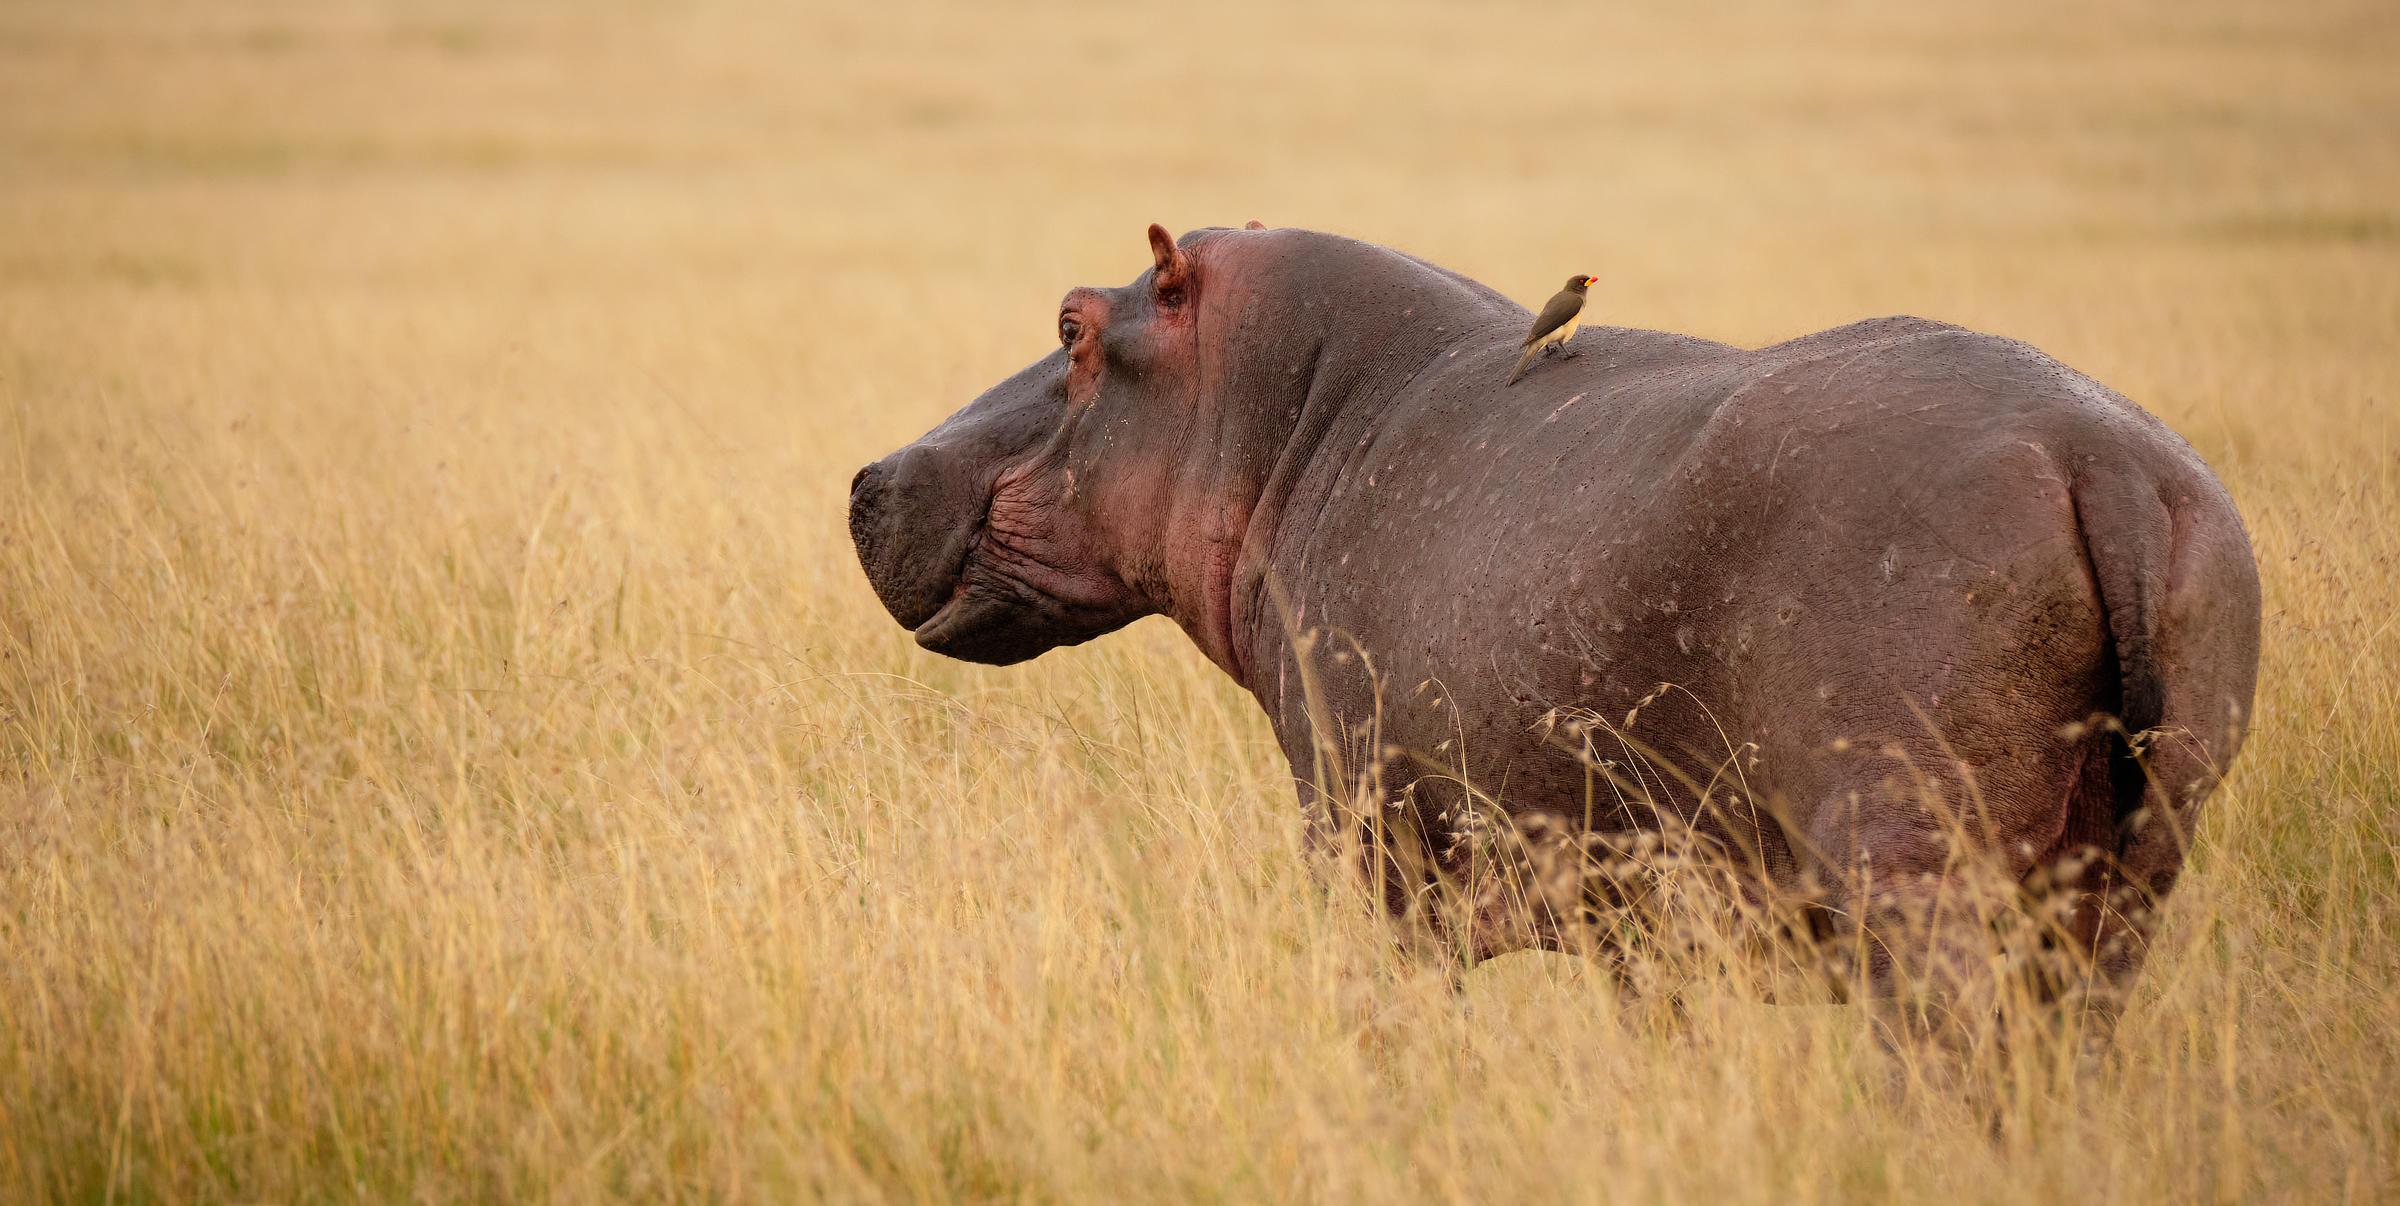 Hippo Maasai Mara African Photography Safari Alan Hewitt